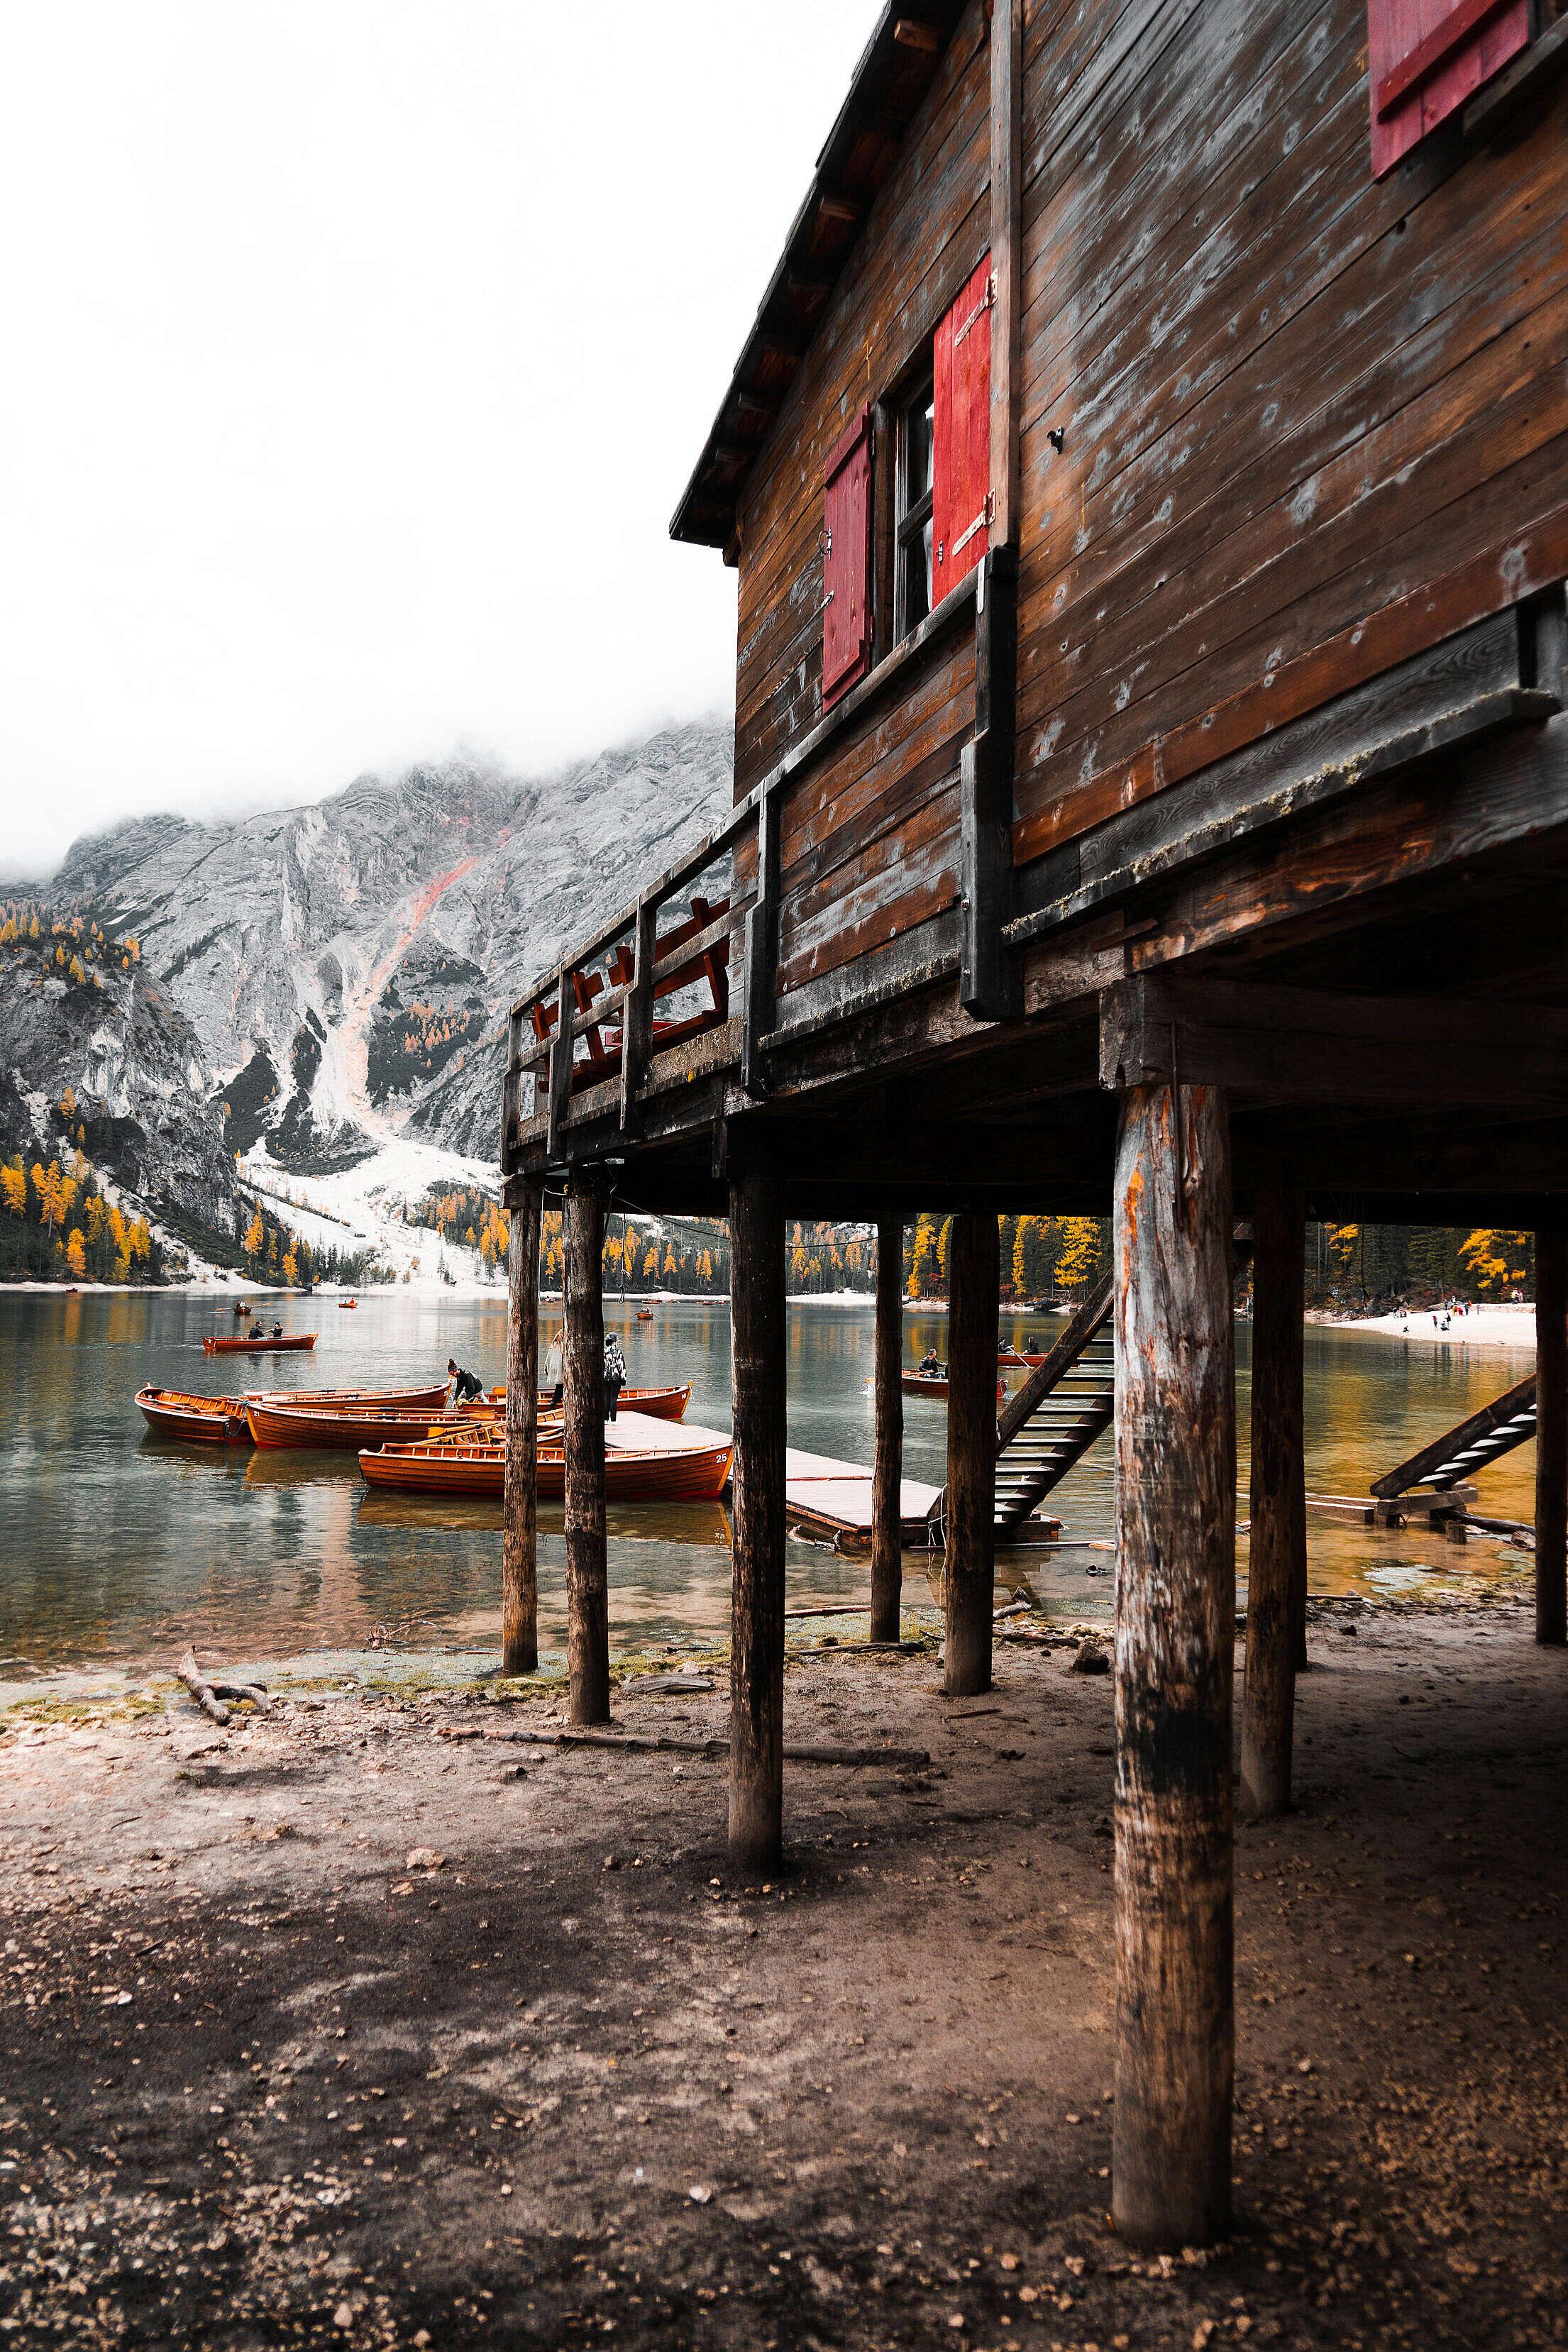 Pier Lago di Braies, Dolomites Italy Free Stock Photo